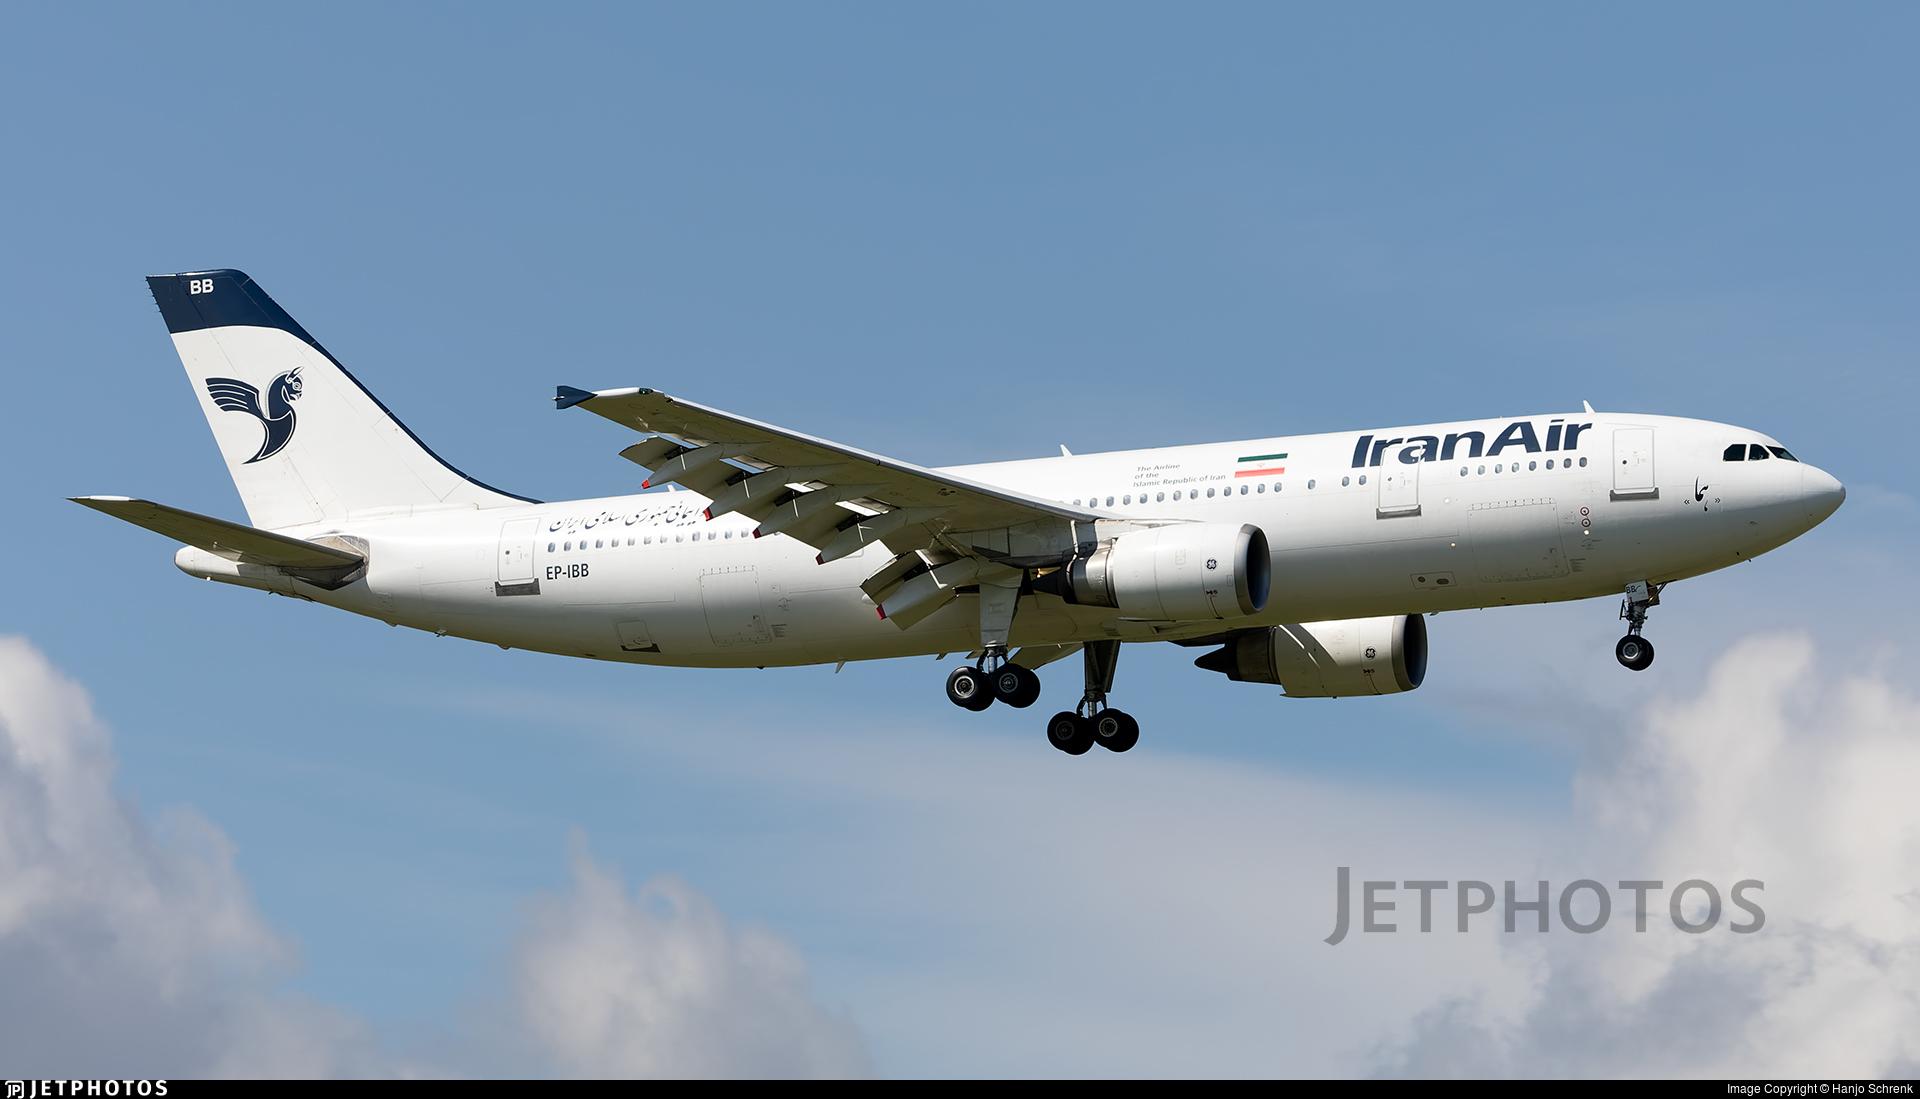 EP-IBB - Airbus A300B4-605R - Iran Air